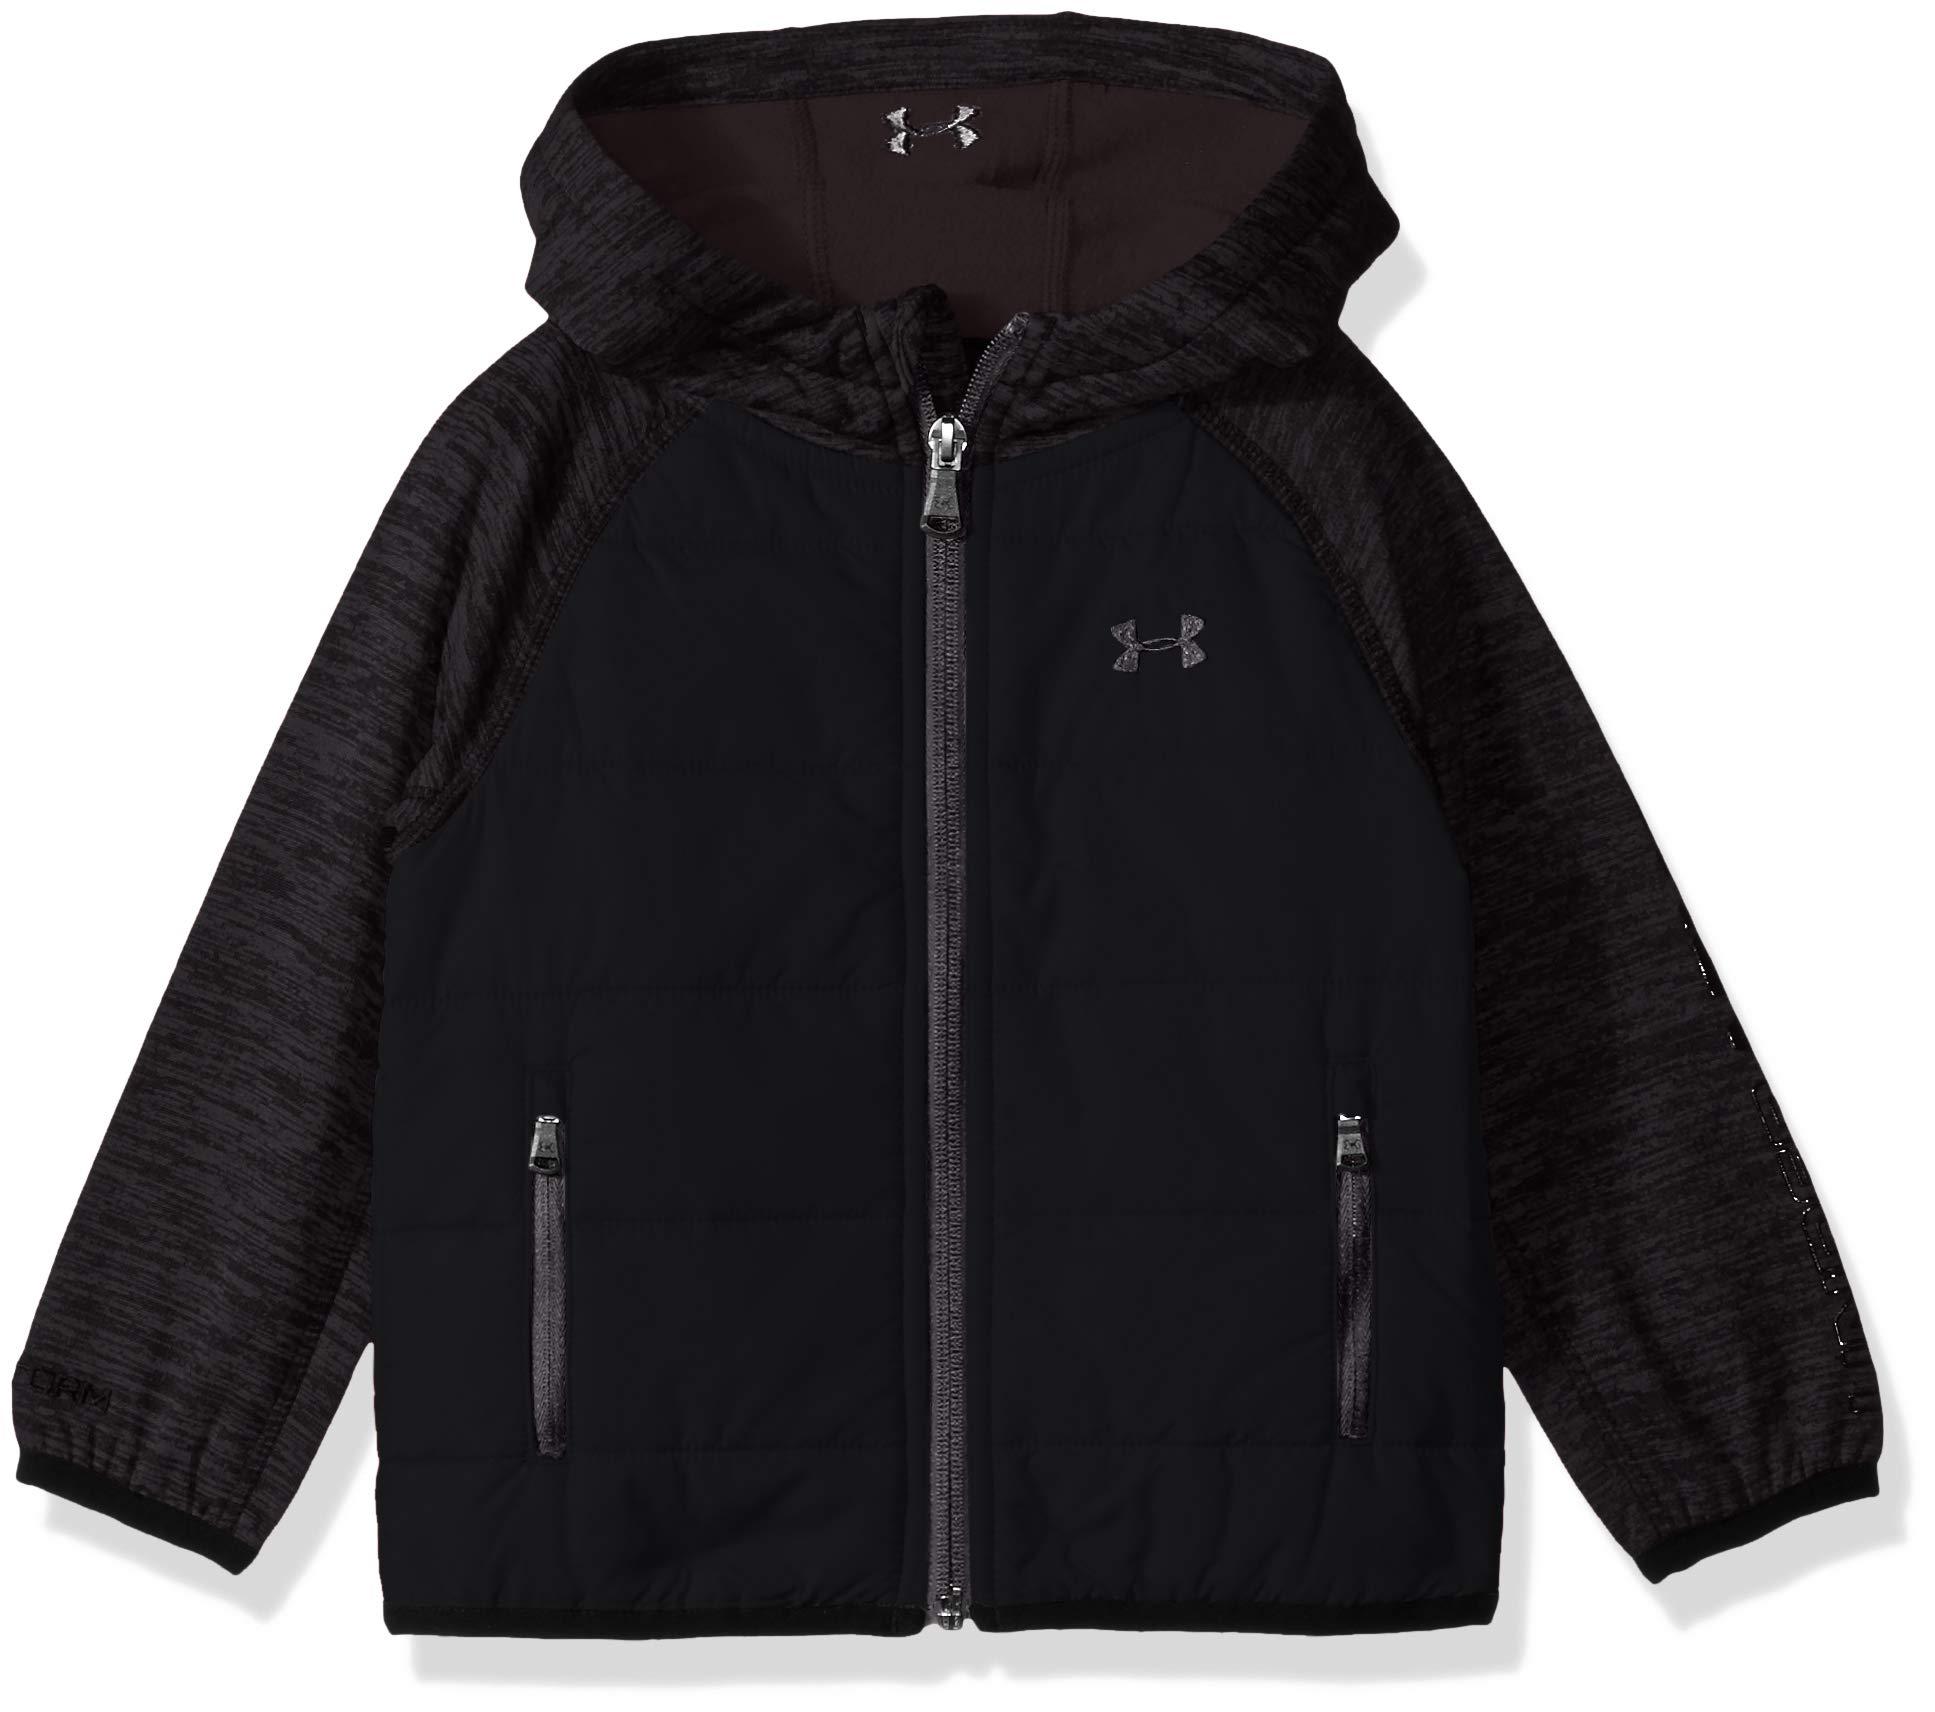 Under Armour Boys' Big Day Trekker Hooded Hybrid Jacket, Black, Large (14/16)